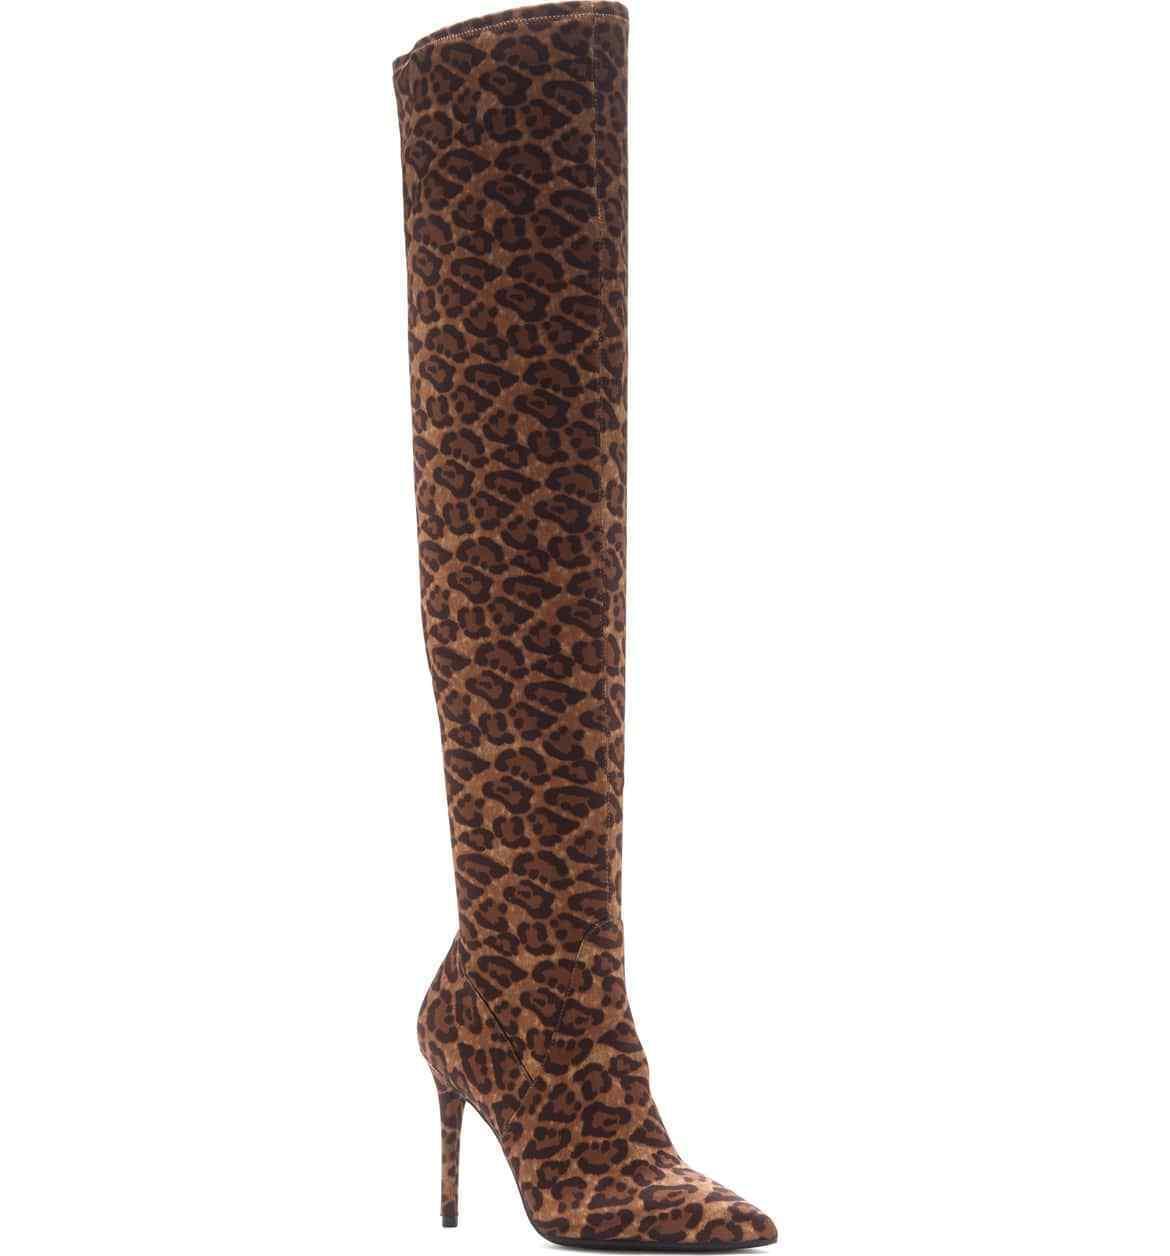 Jessica Simpson Mujer Laken bota Natural Leopardo